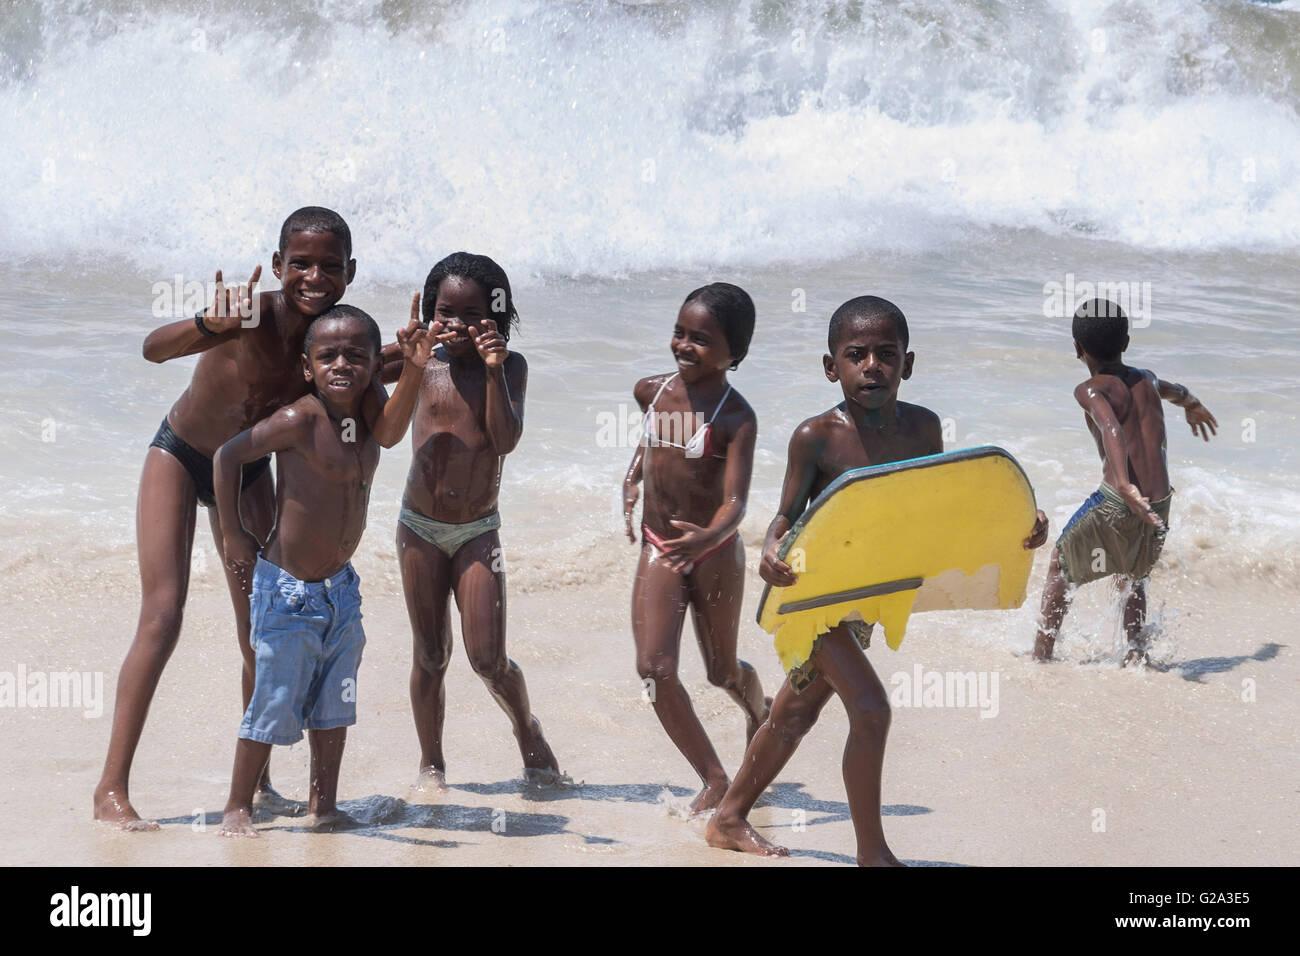 Rio De Janeiro Copacabana Strand Kinder mit Surfbrett Stockbild